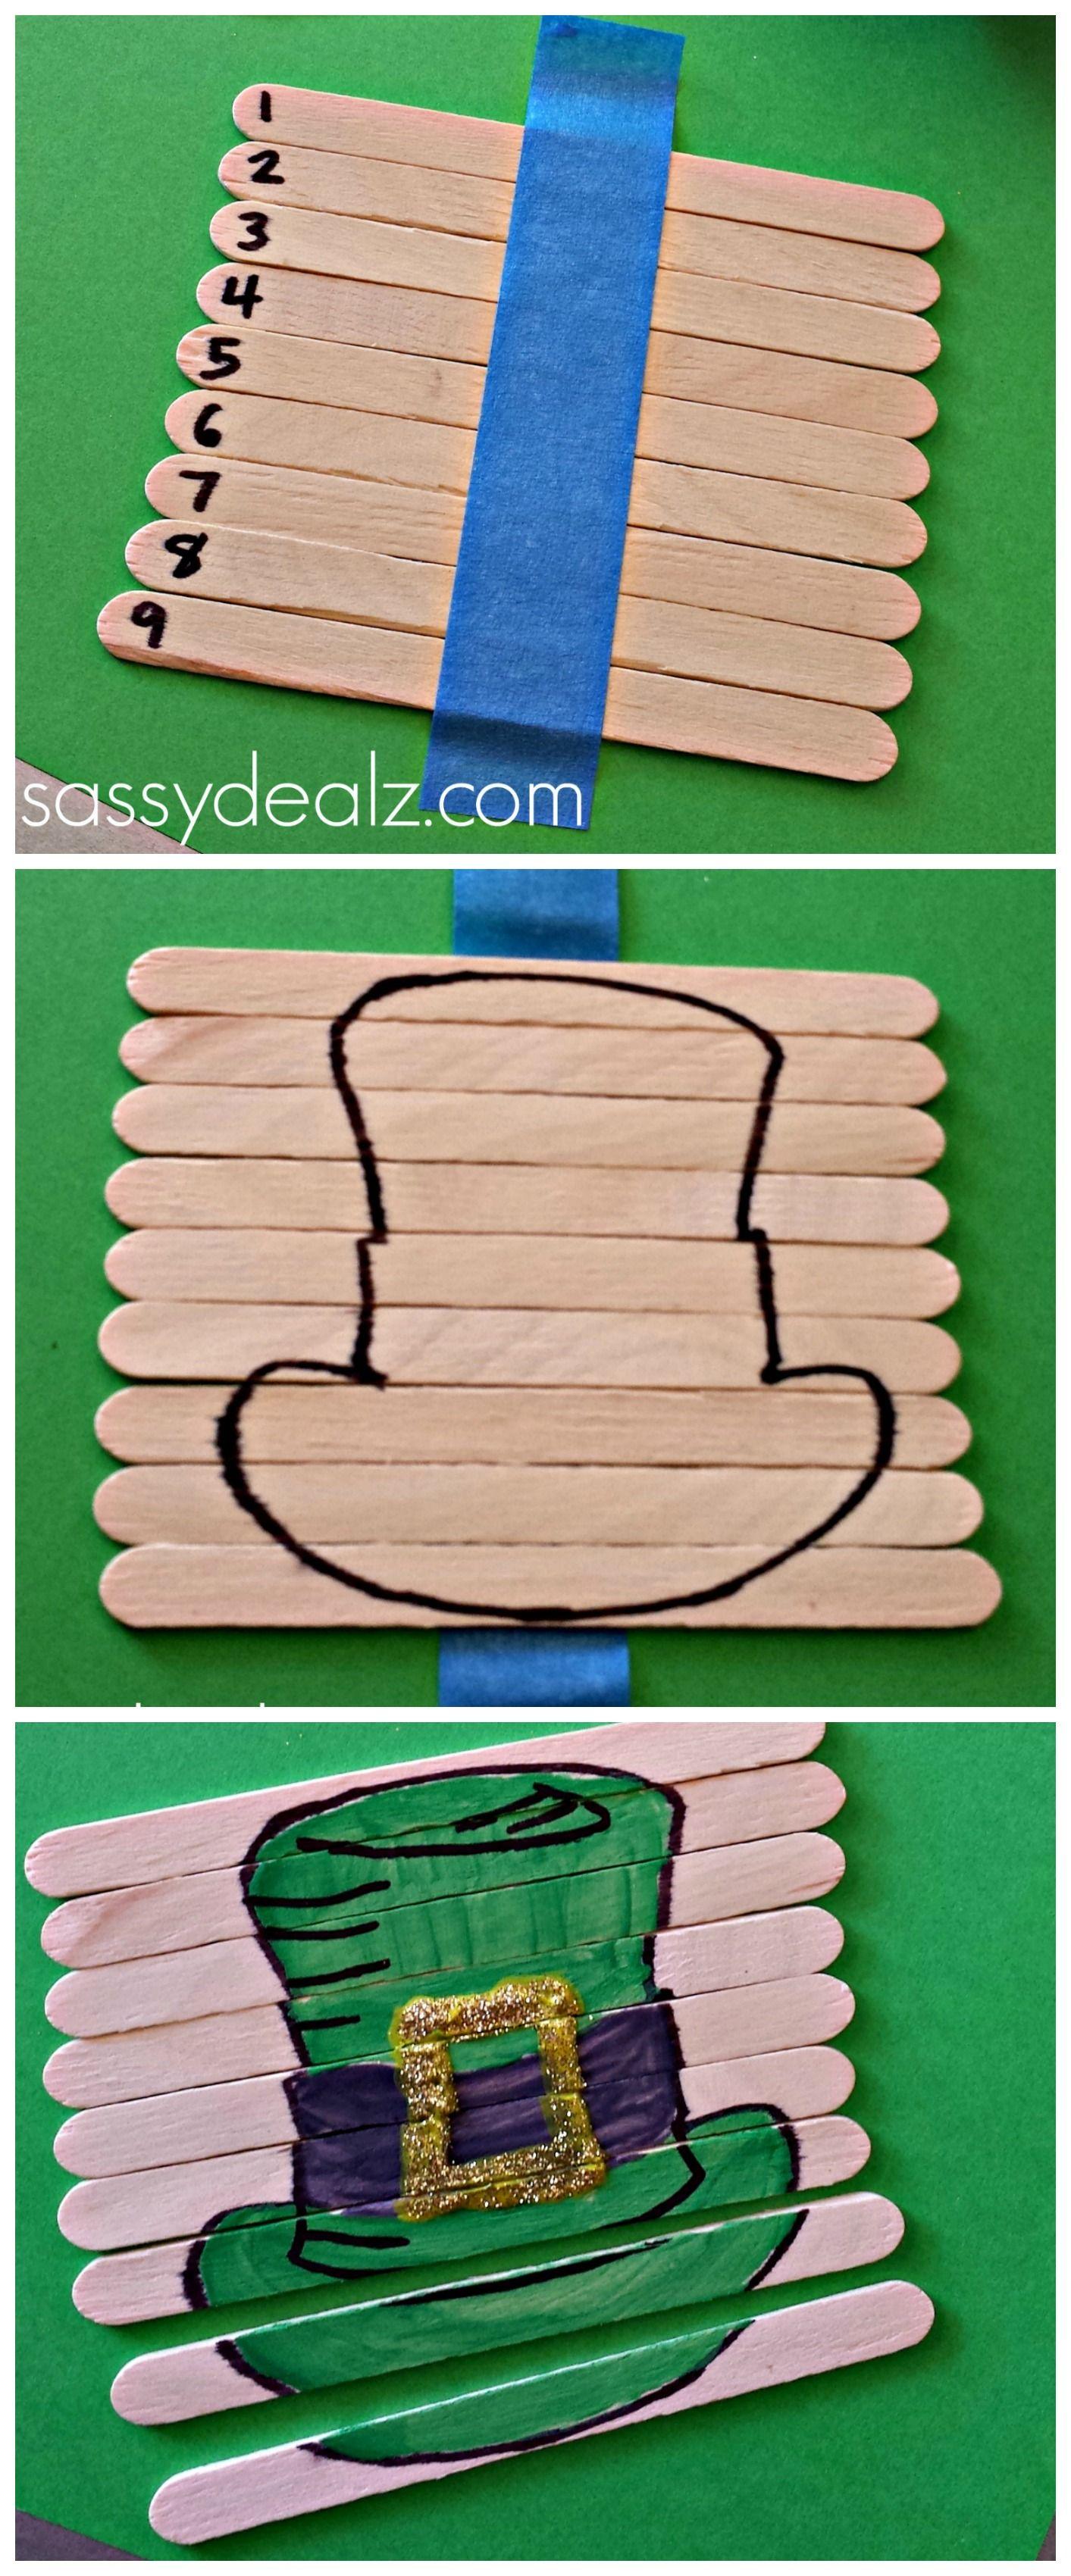 Leprechaun Hat Popsicle Stick Puzzle For St Patricks Day Kids Activity Diy